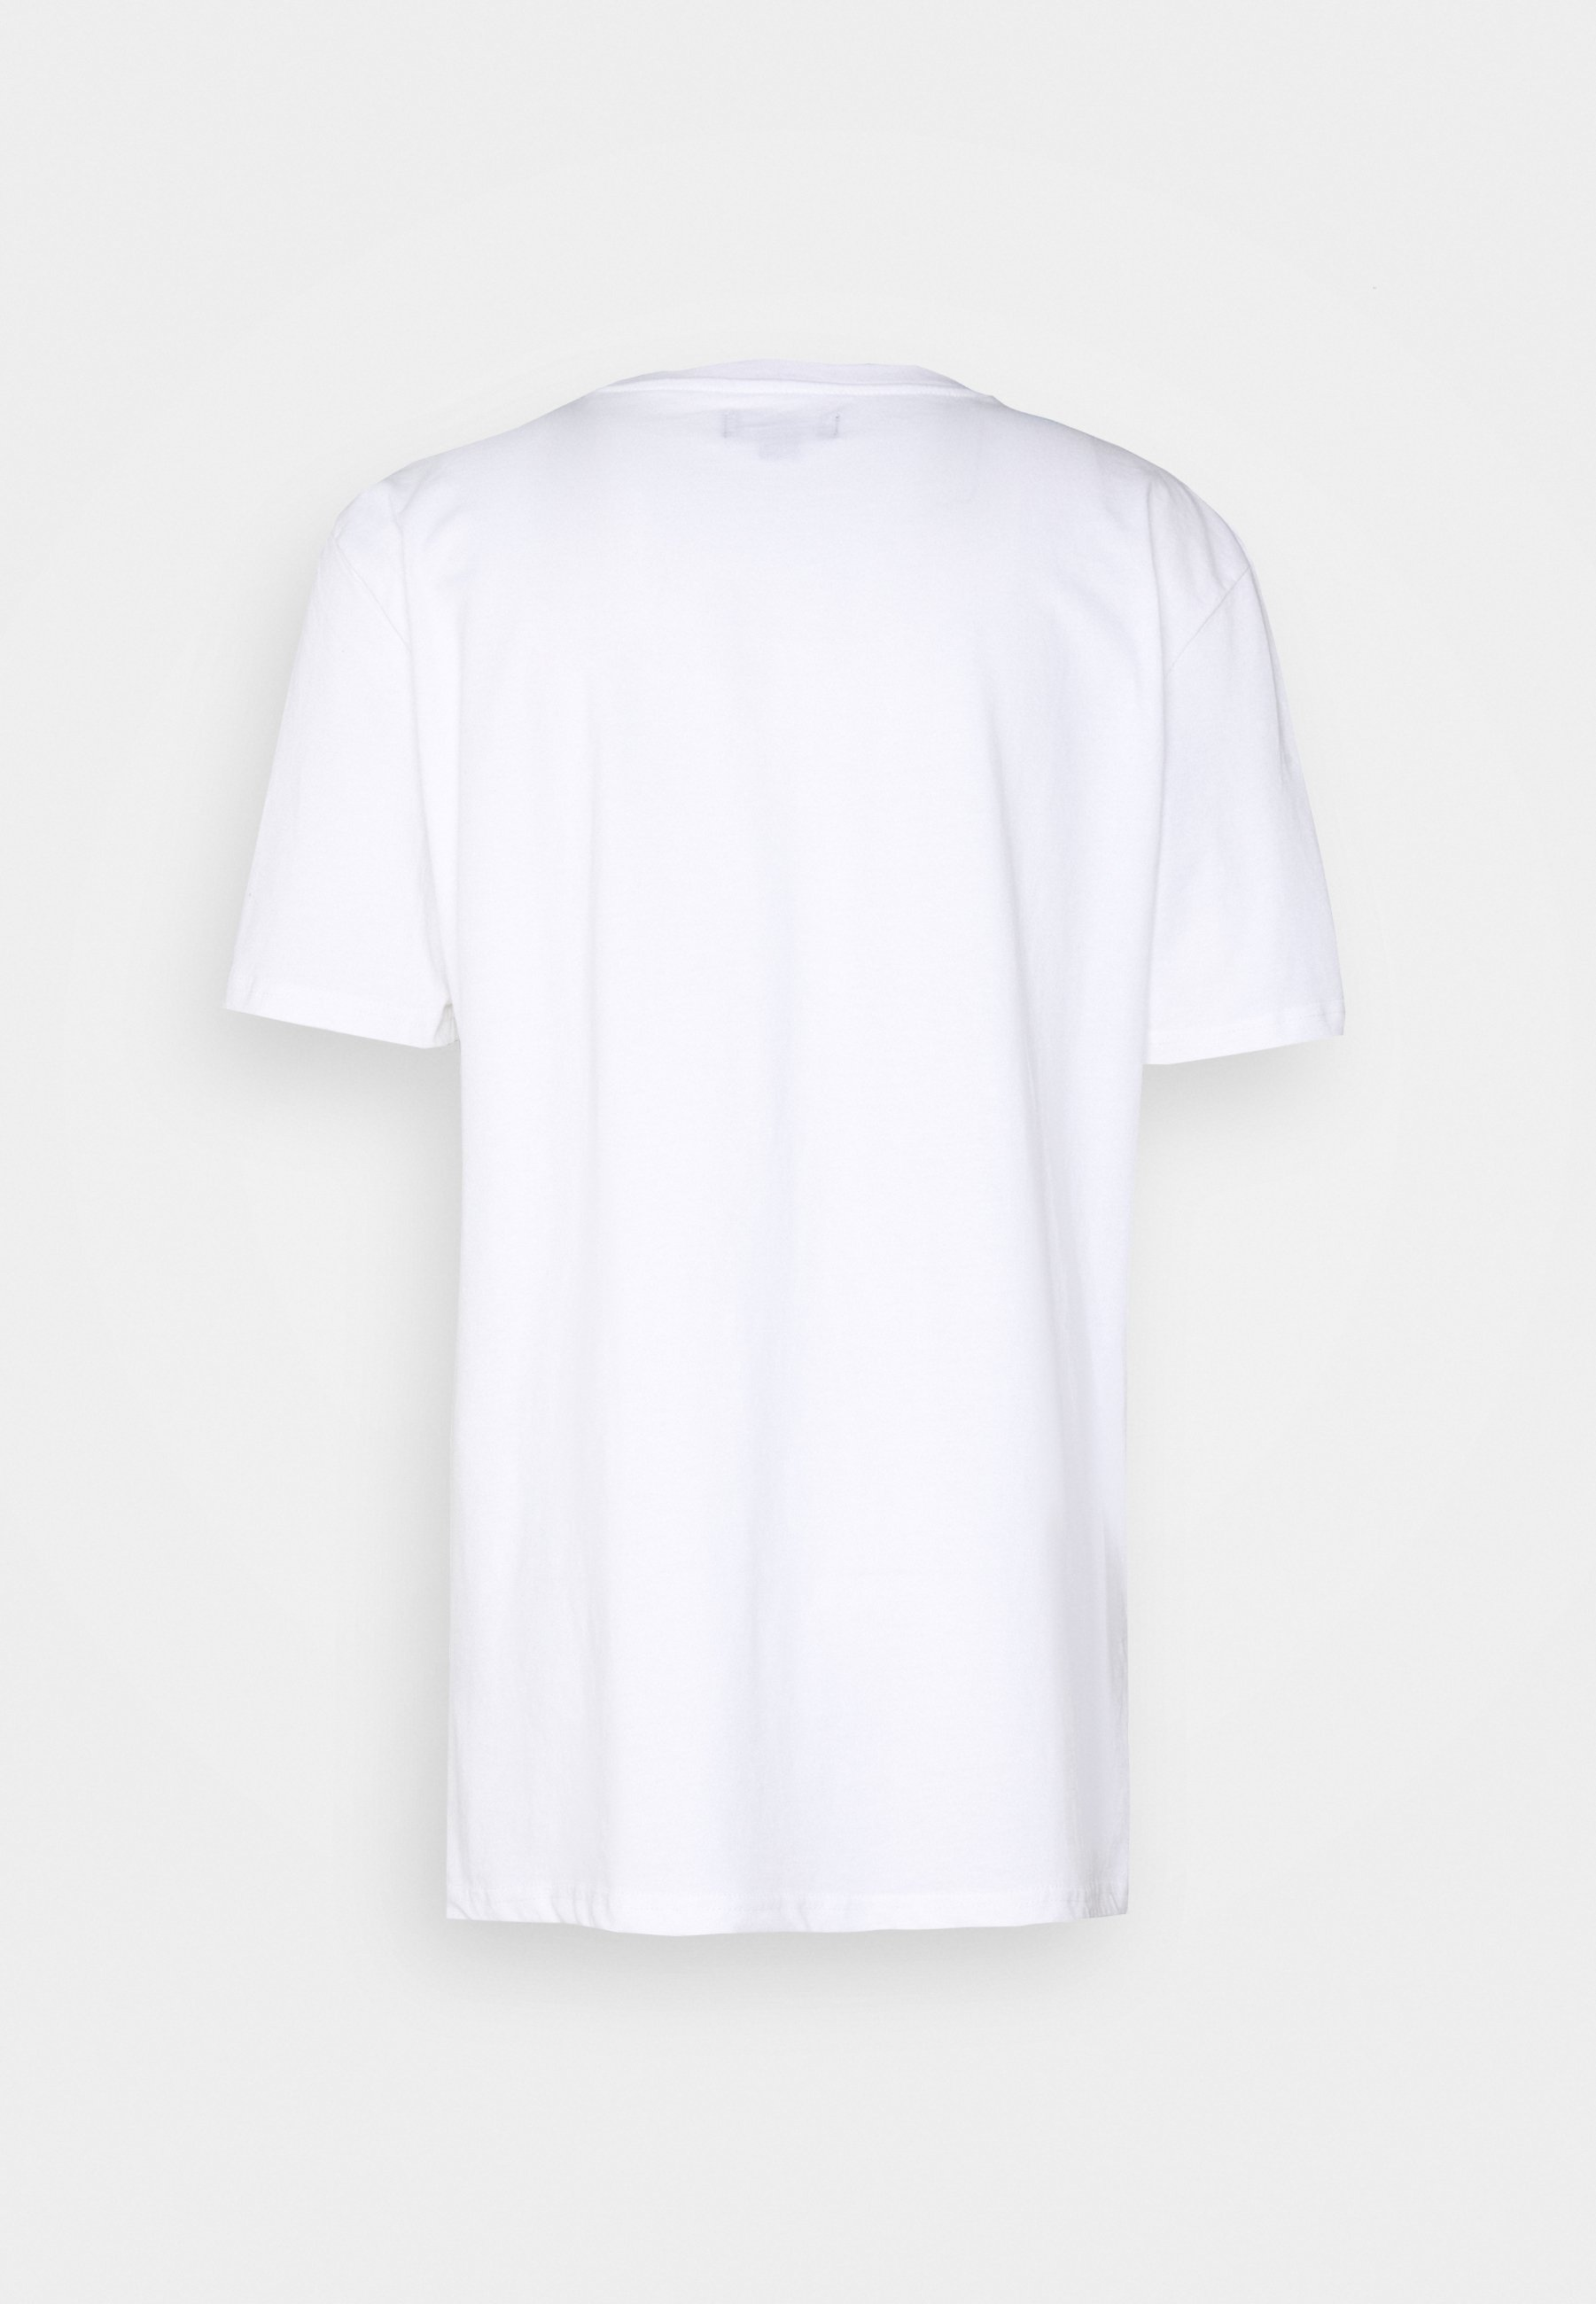 Urban Threads Graphic Printed Oversized - T-shirt Print White